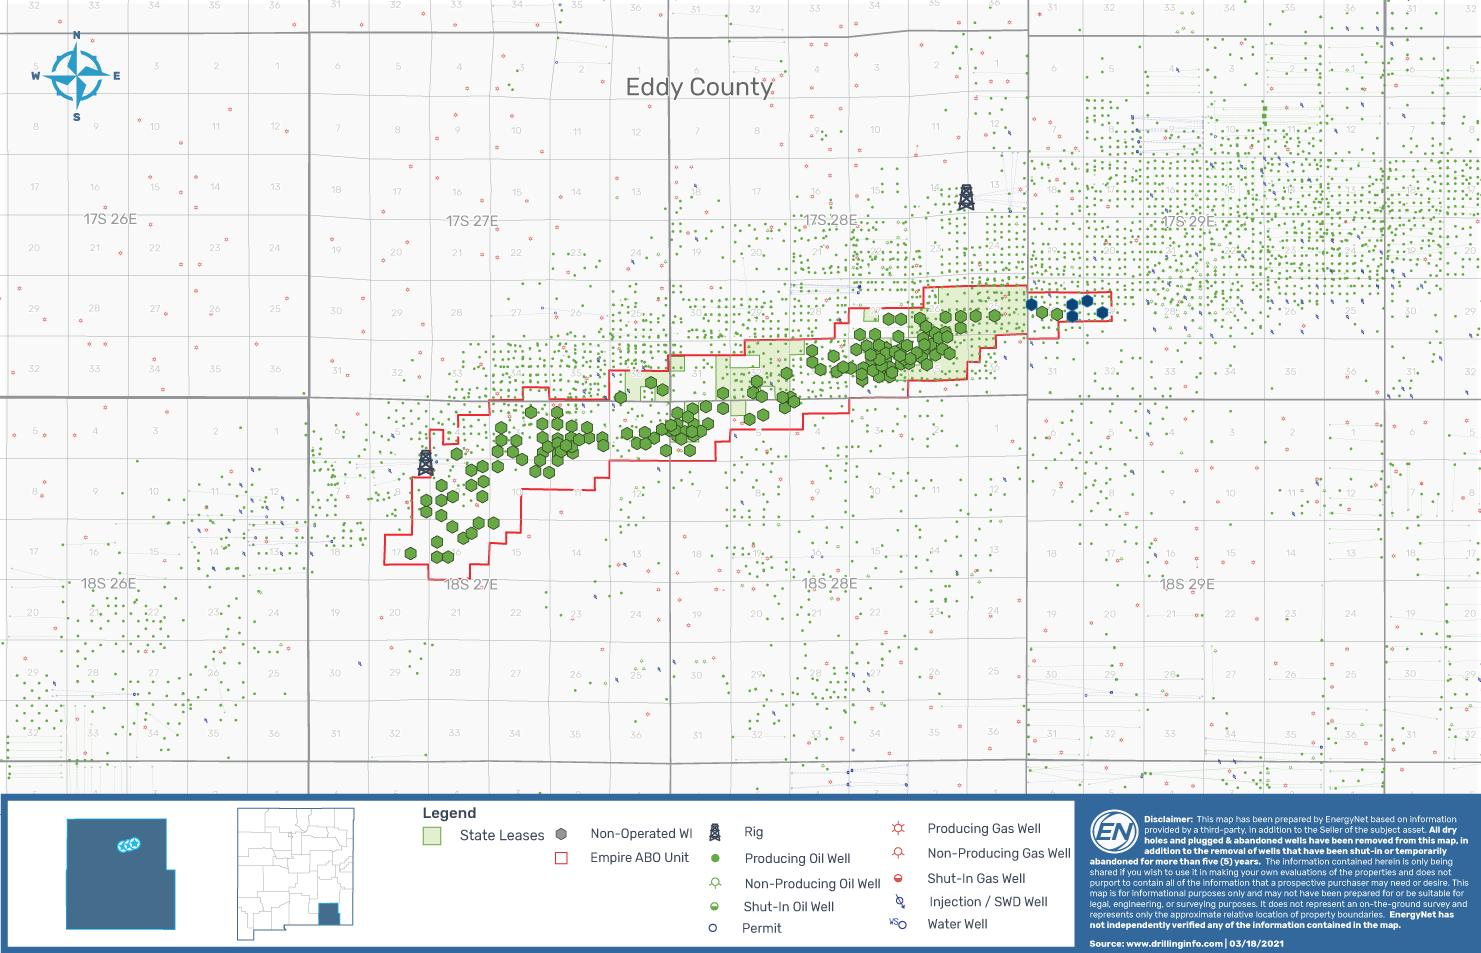 EnergyNet Lot 73481 - EOG Resources 160 Well بسته بندی نقشه